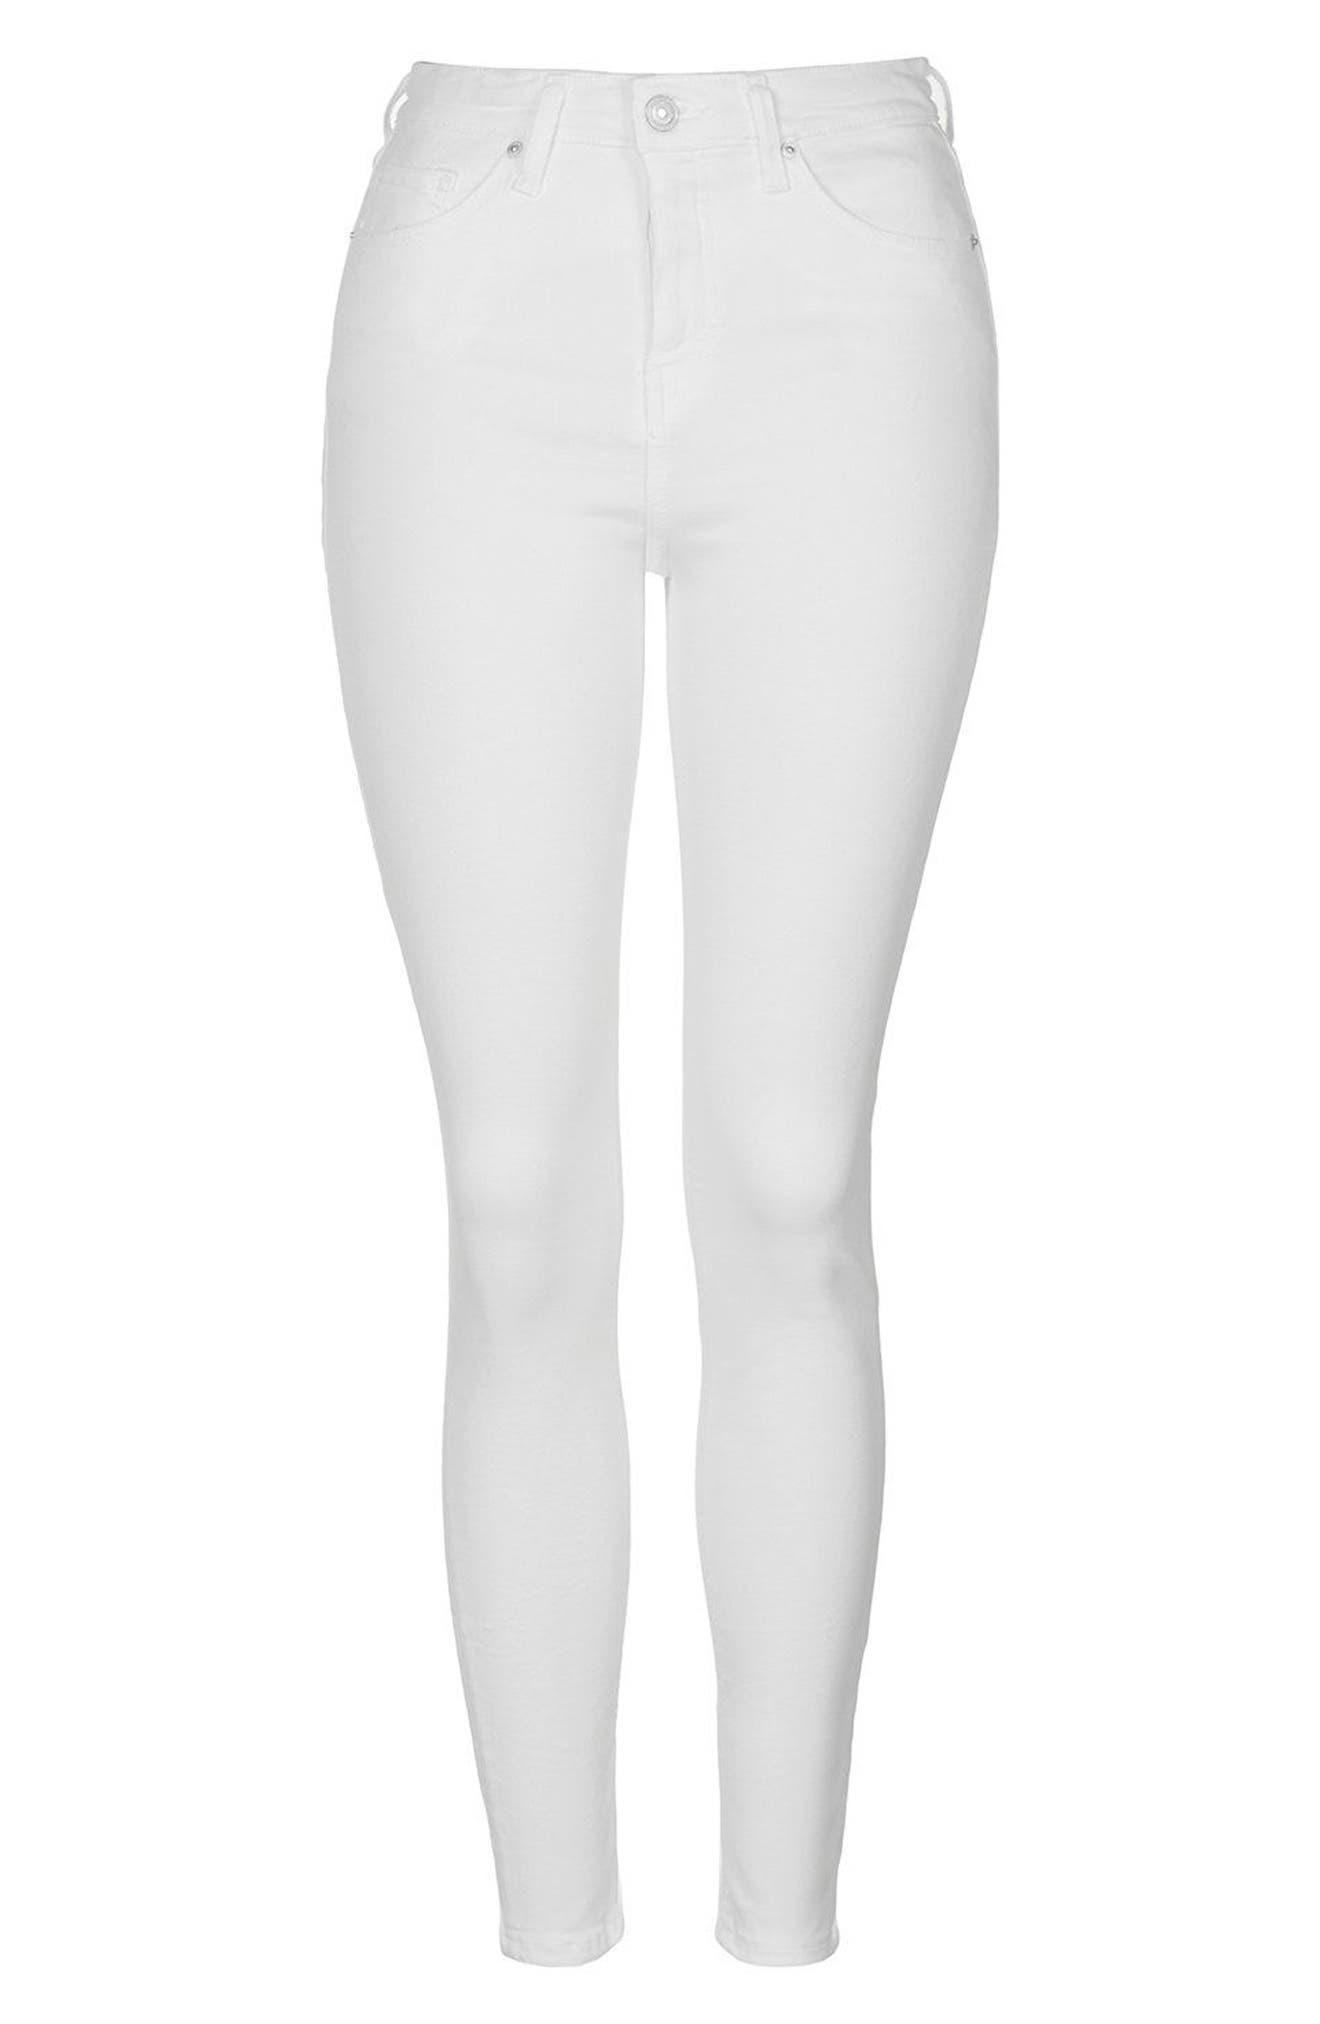 Moto Jamie Jeans,                             Alternate thumbnail 6, color,                             White